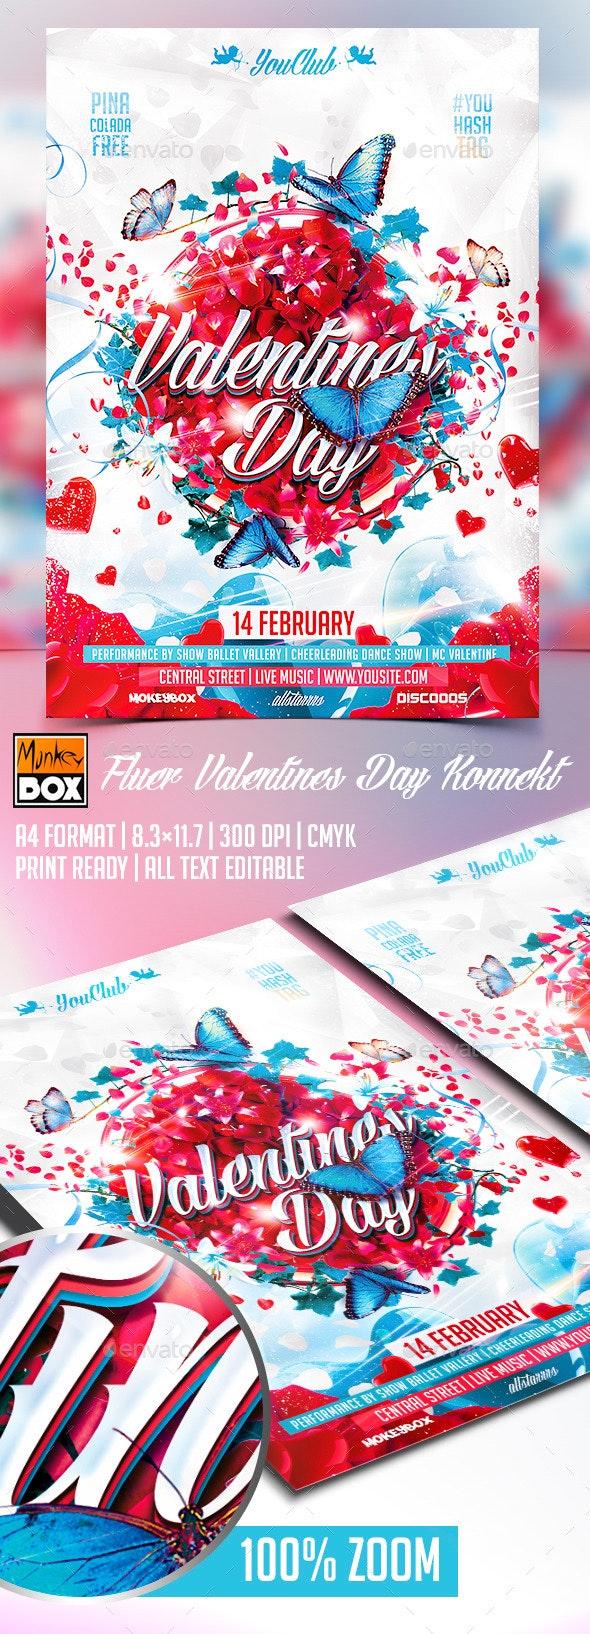 Flyer Valentines Day Konnekt - Events Flyers